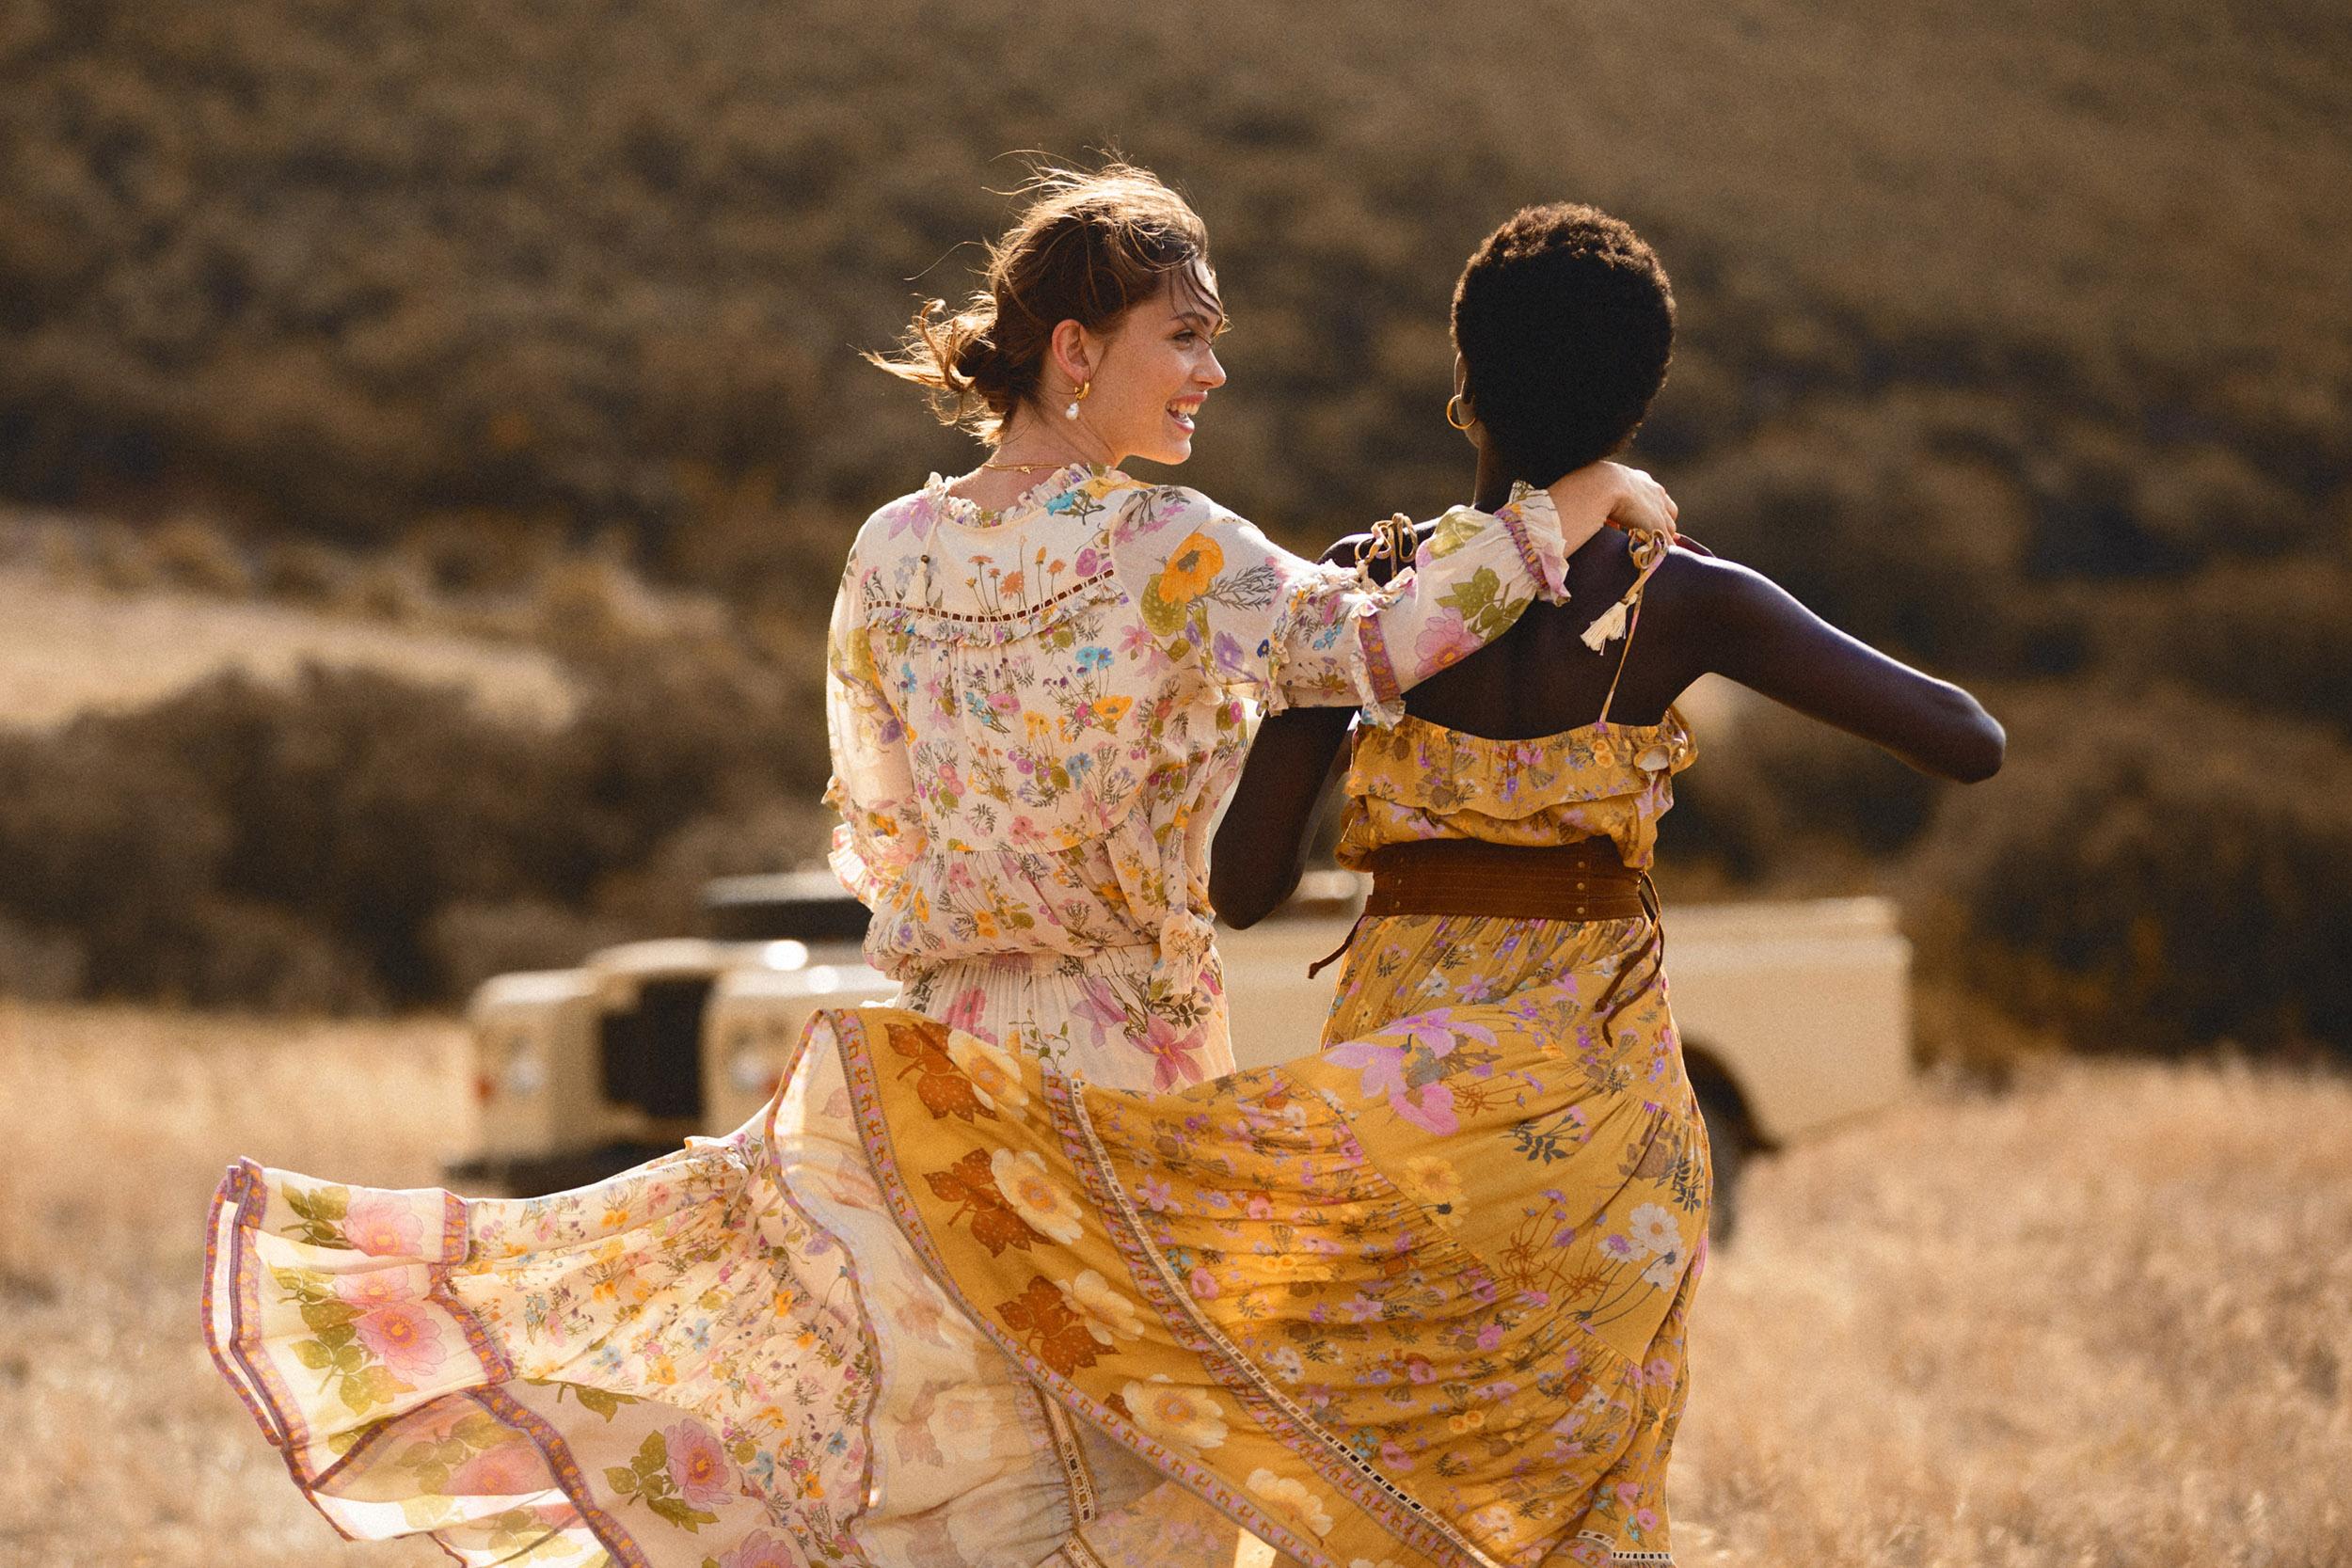 Spell-wild-bloom-strappy-maxi-dress-mustard-blouse-maxi-skirt-cream_D4_4152_HR.jpg